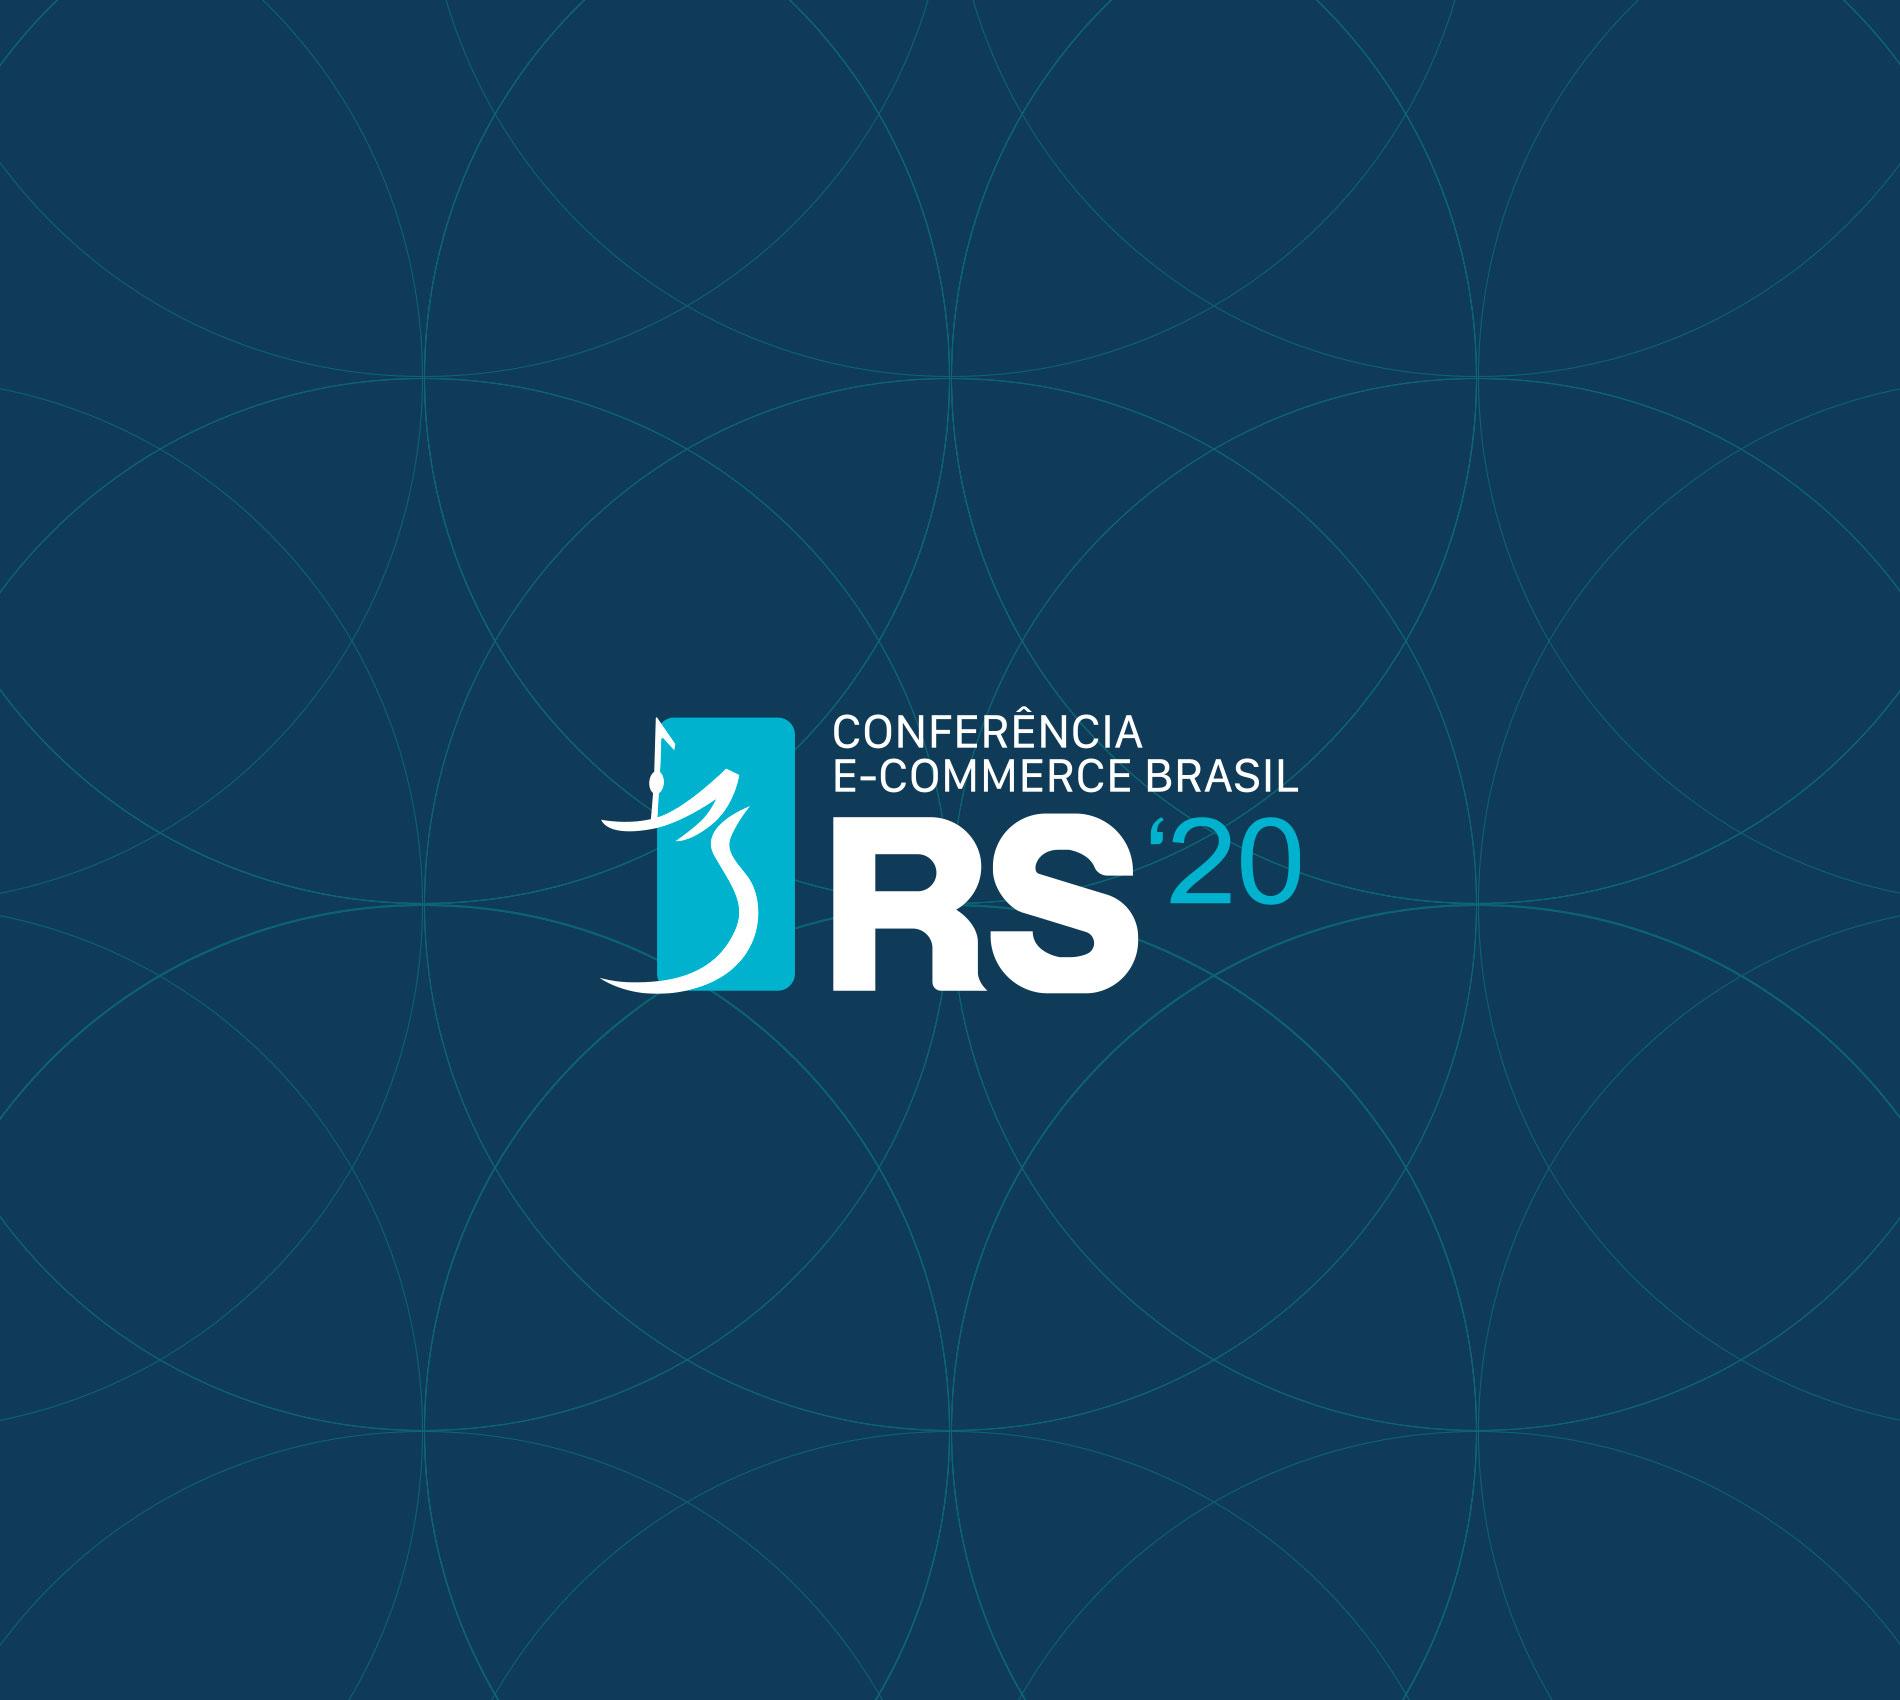 Conferência E-commerce Brasil RS 2020